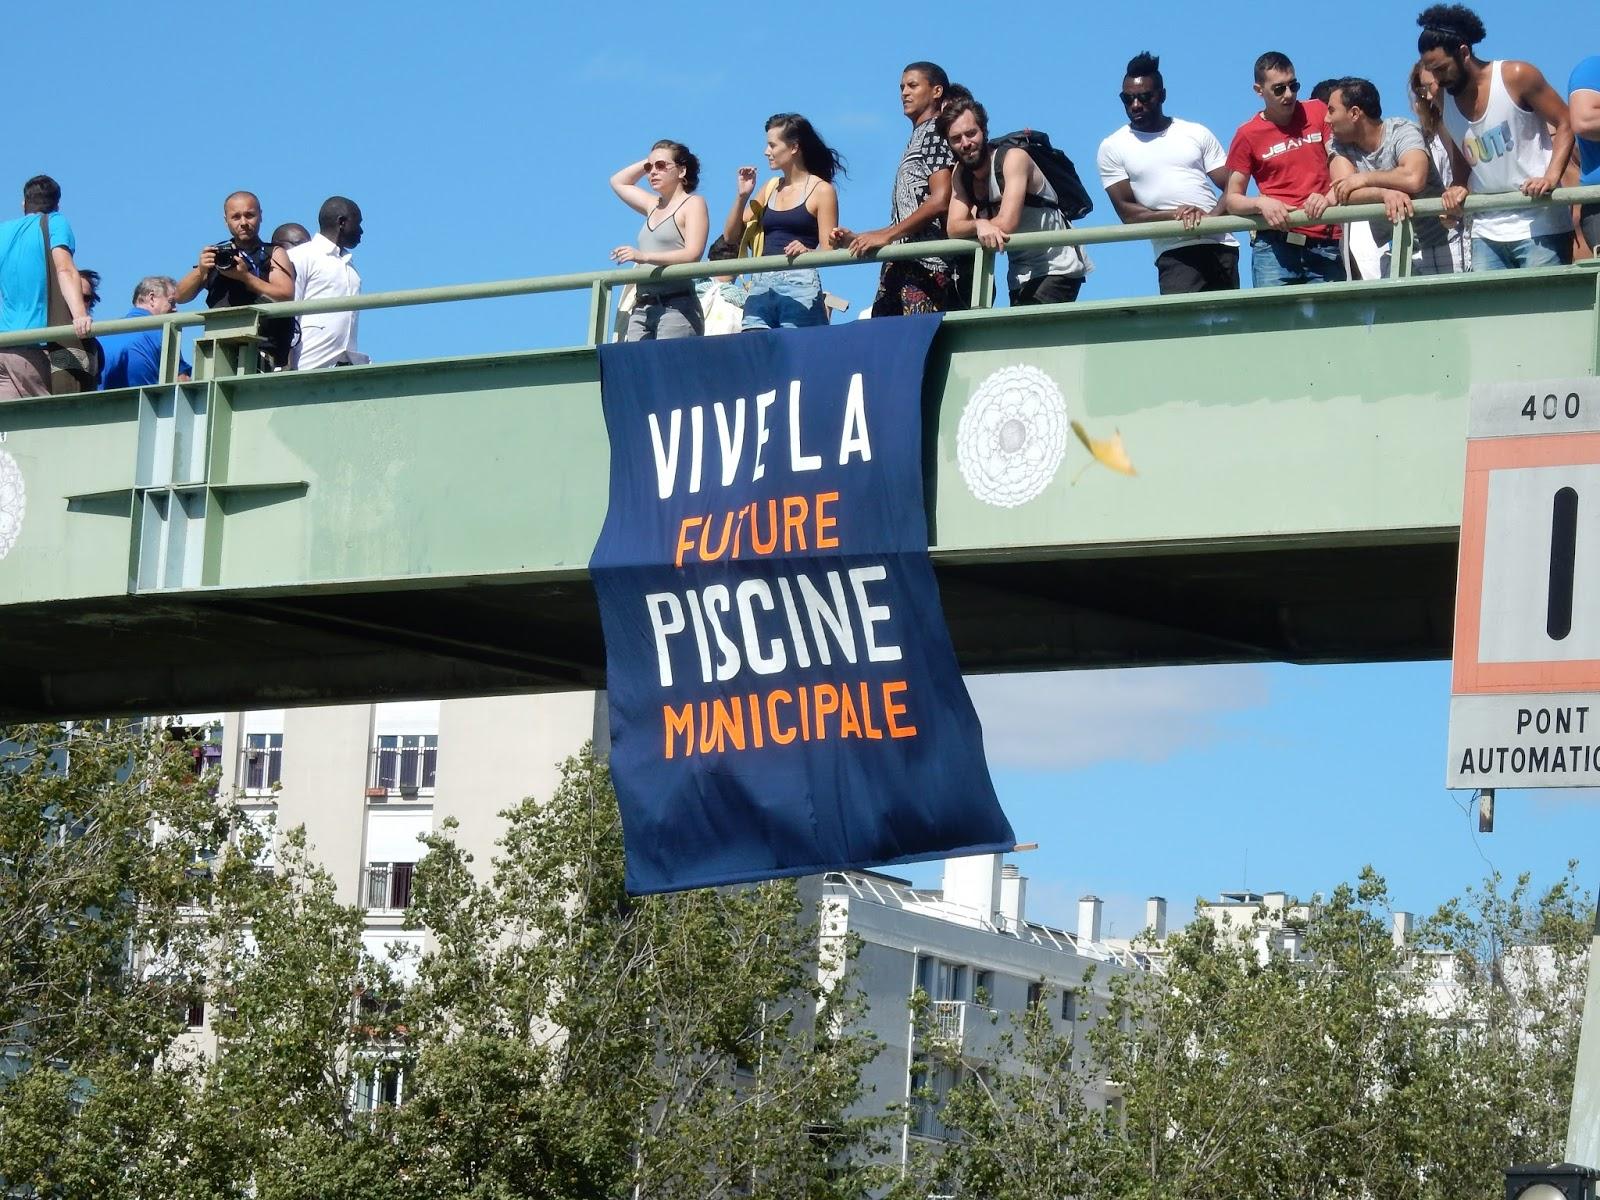 Gr gory capra baignade publique paris for Piscine publique paris